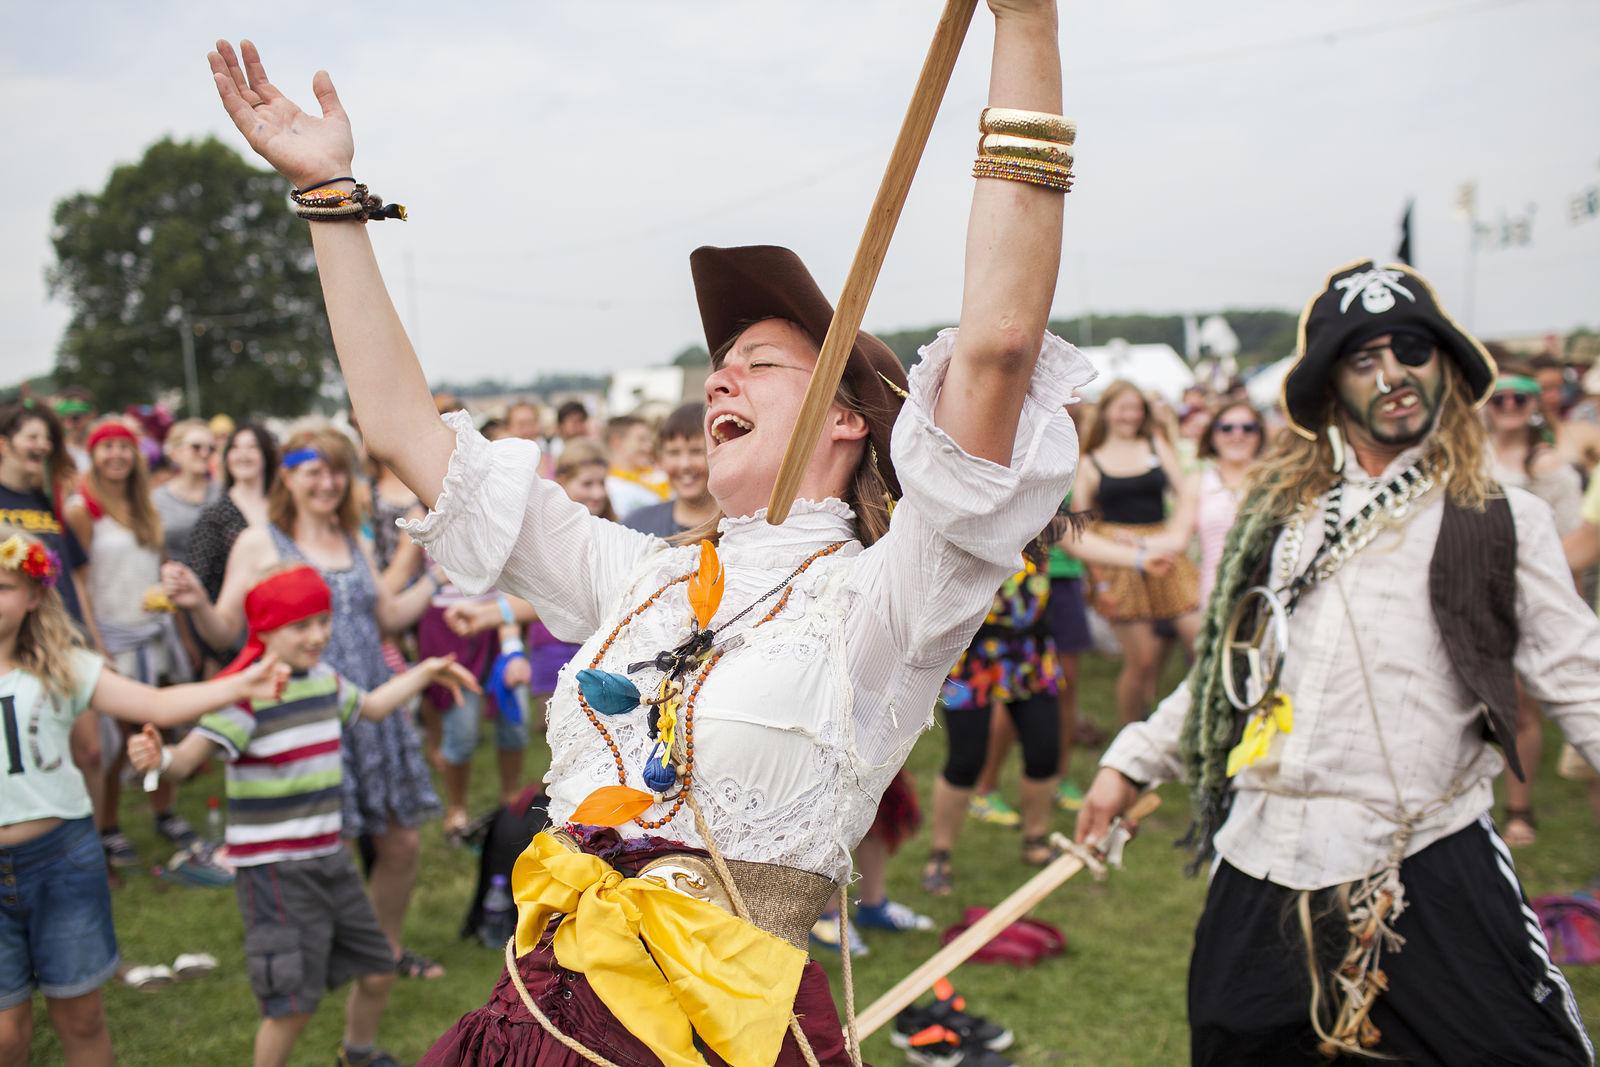 Pirate Booty Dance